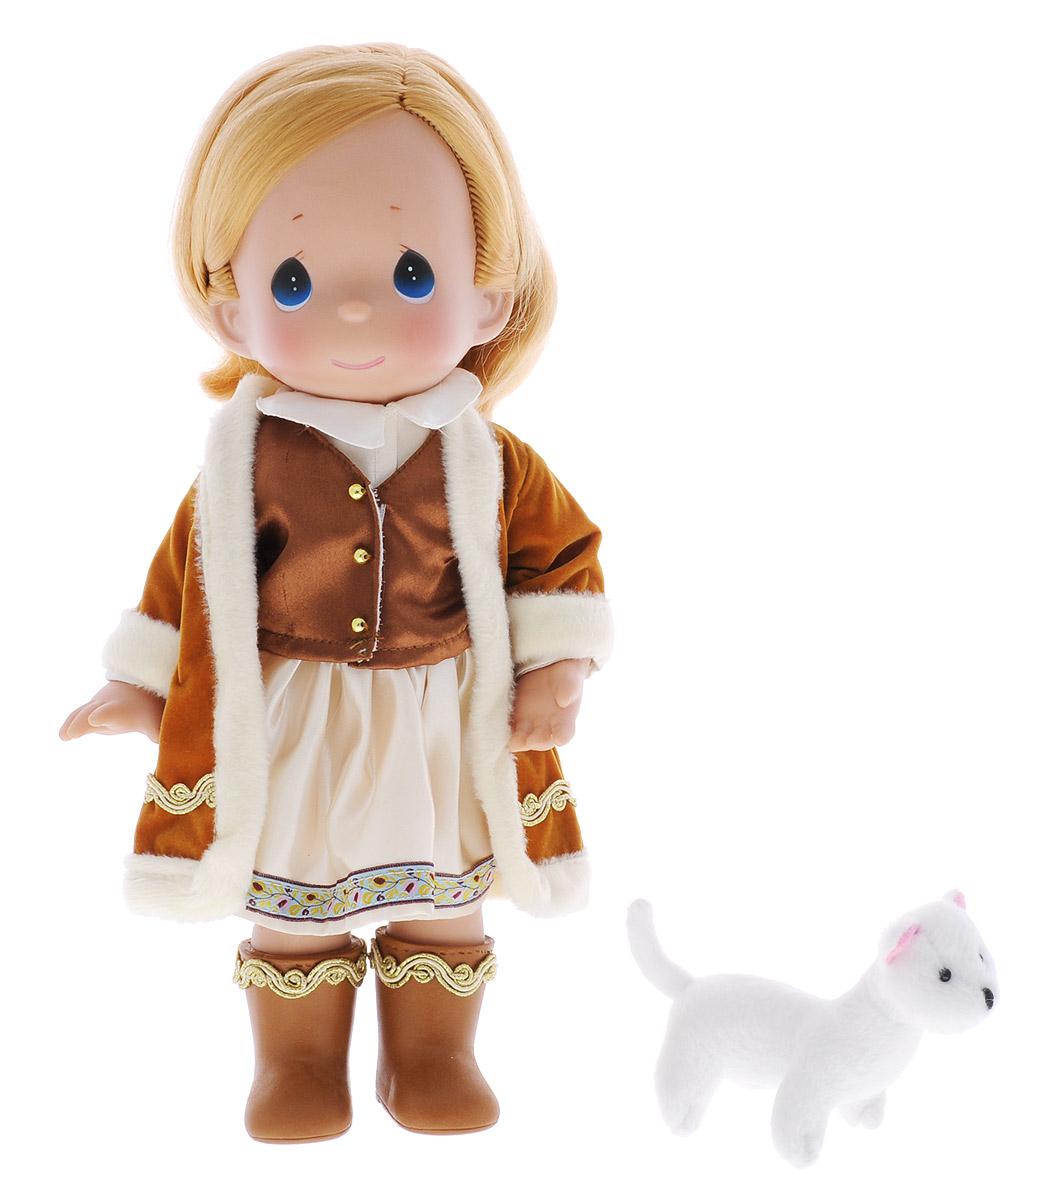 Precious Moments Кукла Герда куклы и одежда для кукол precious кукла балерина рыжая 30 см